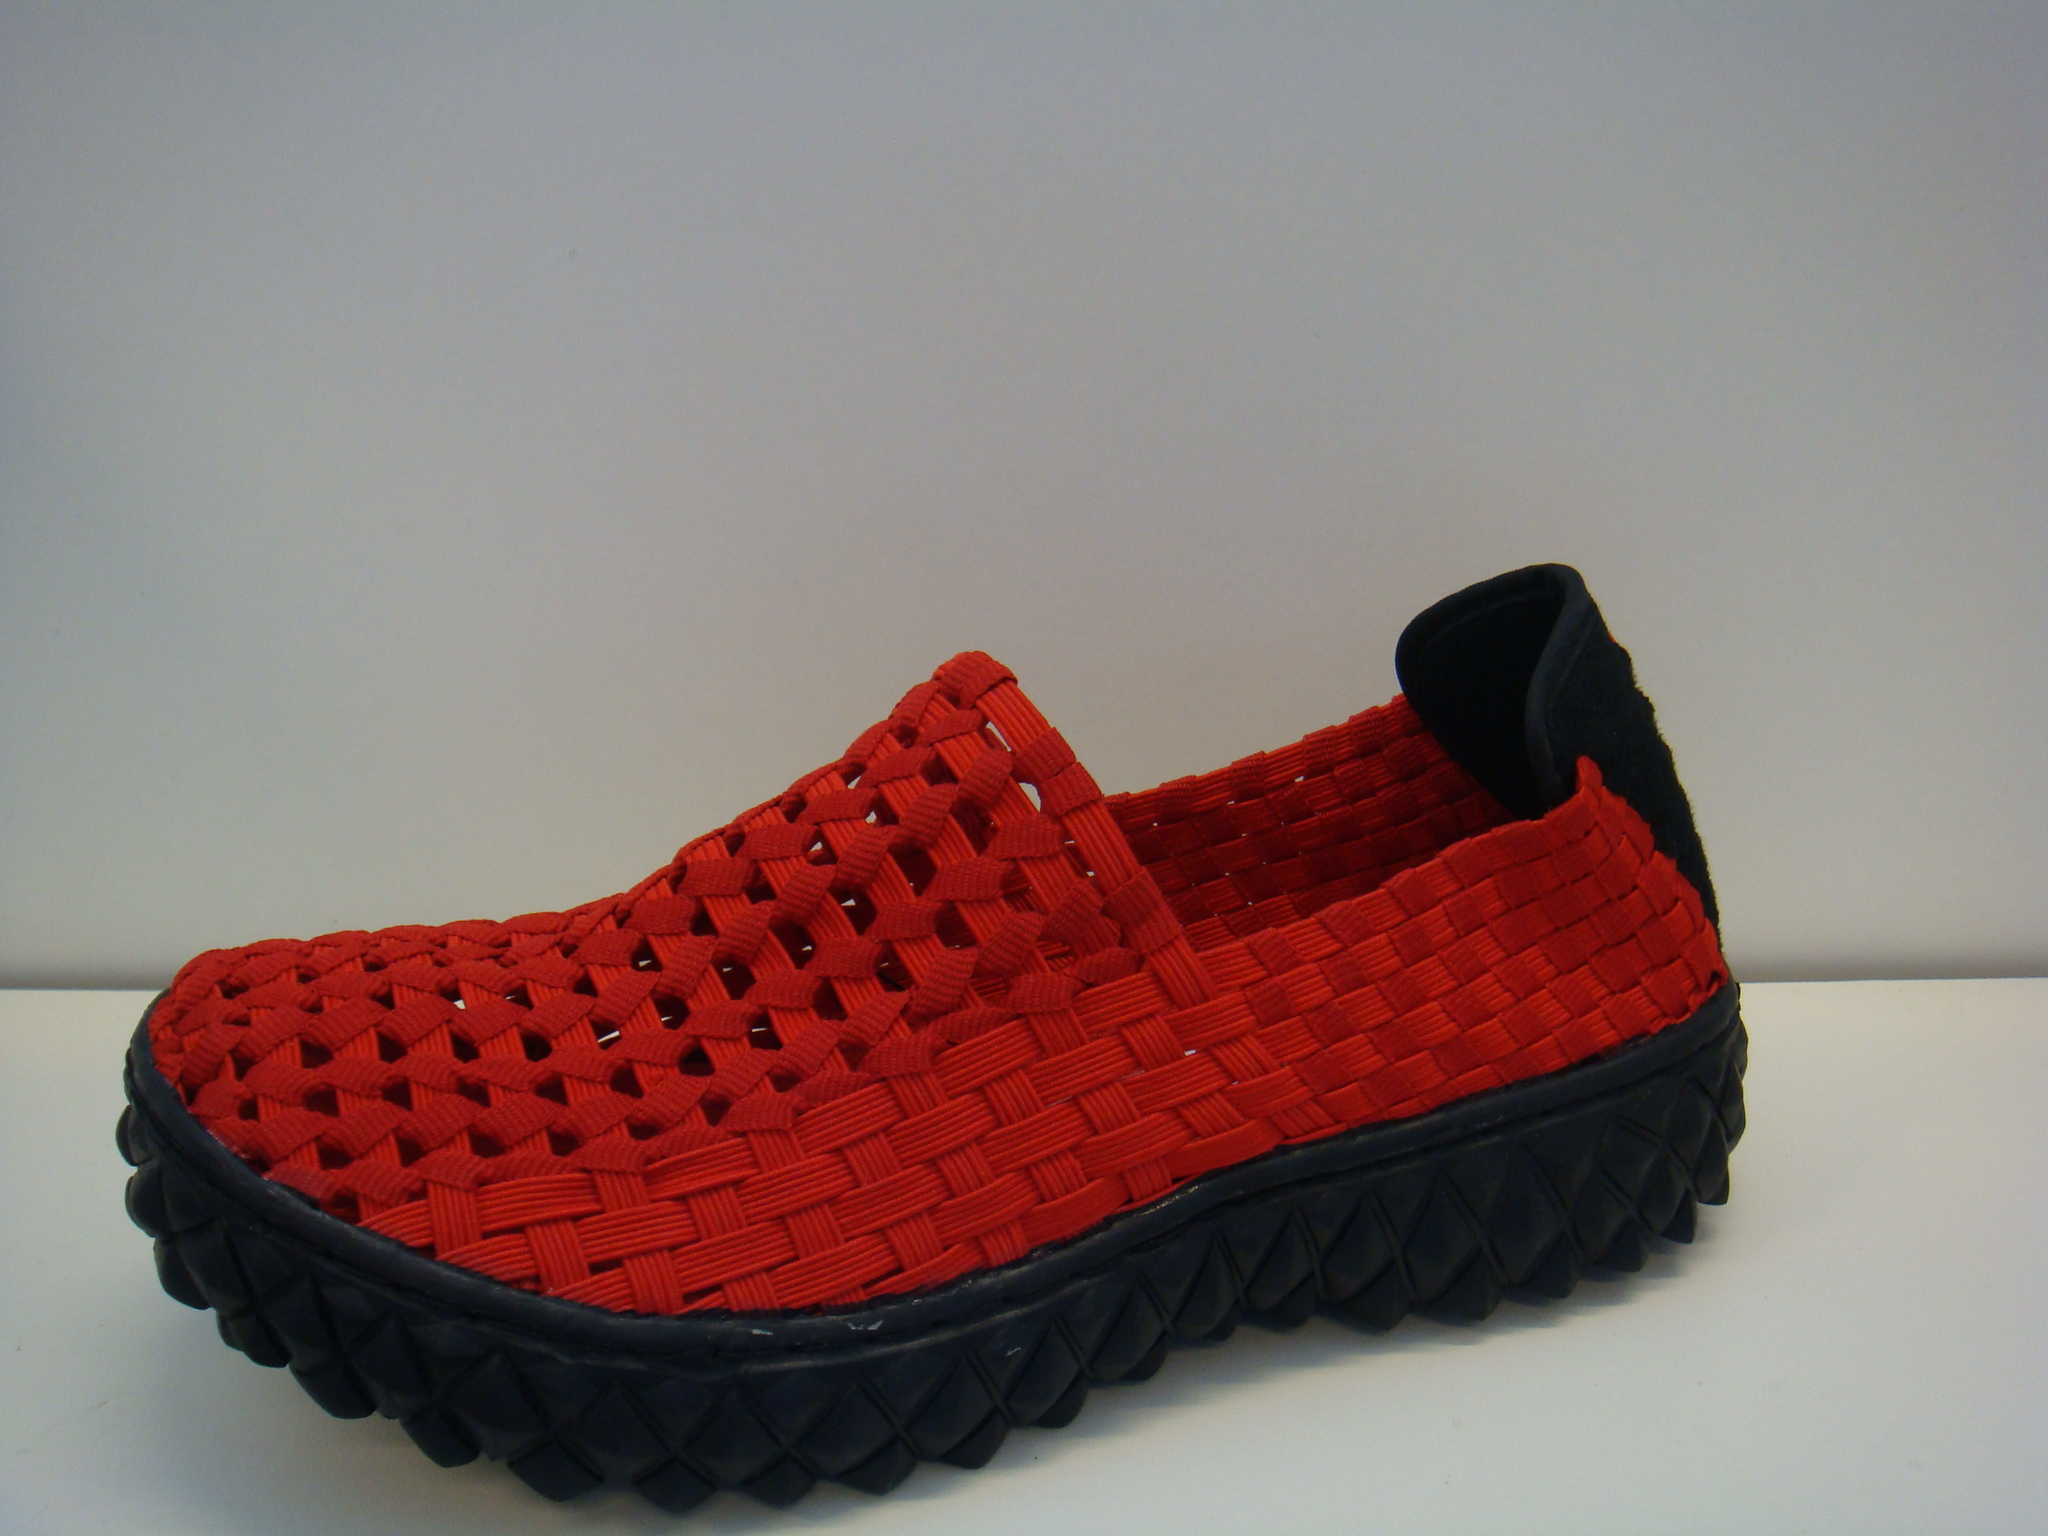 R?d hel sko, gjord av res?r, mjuk och sk?n med svikt.